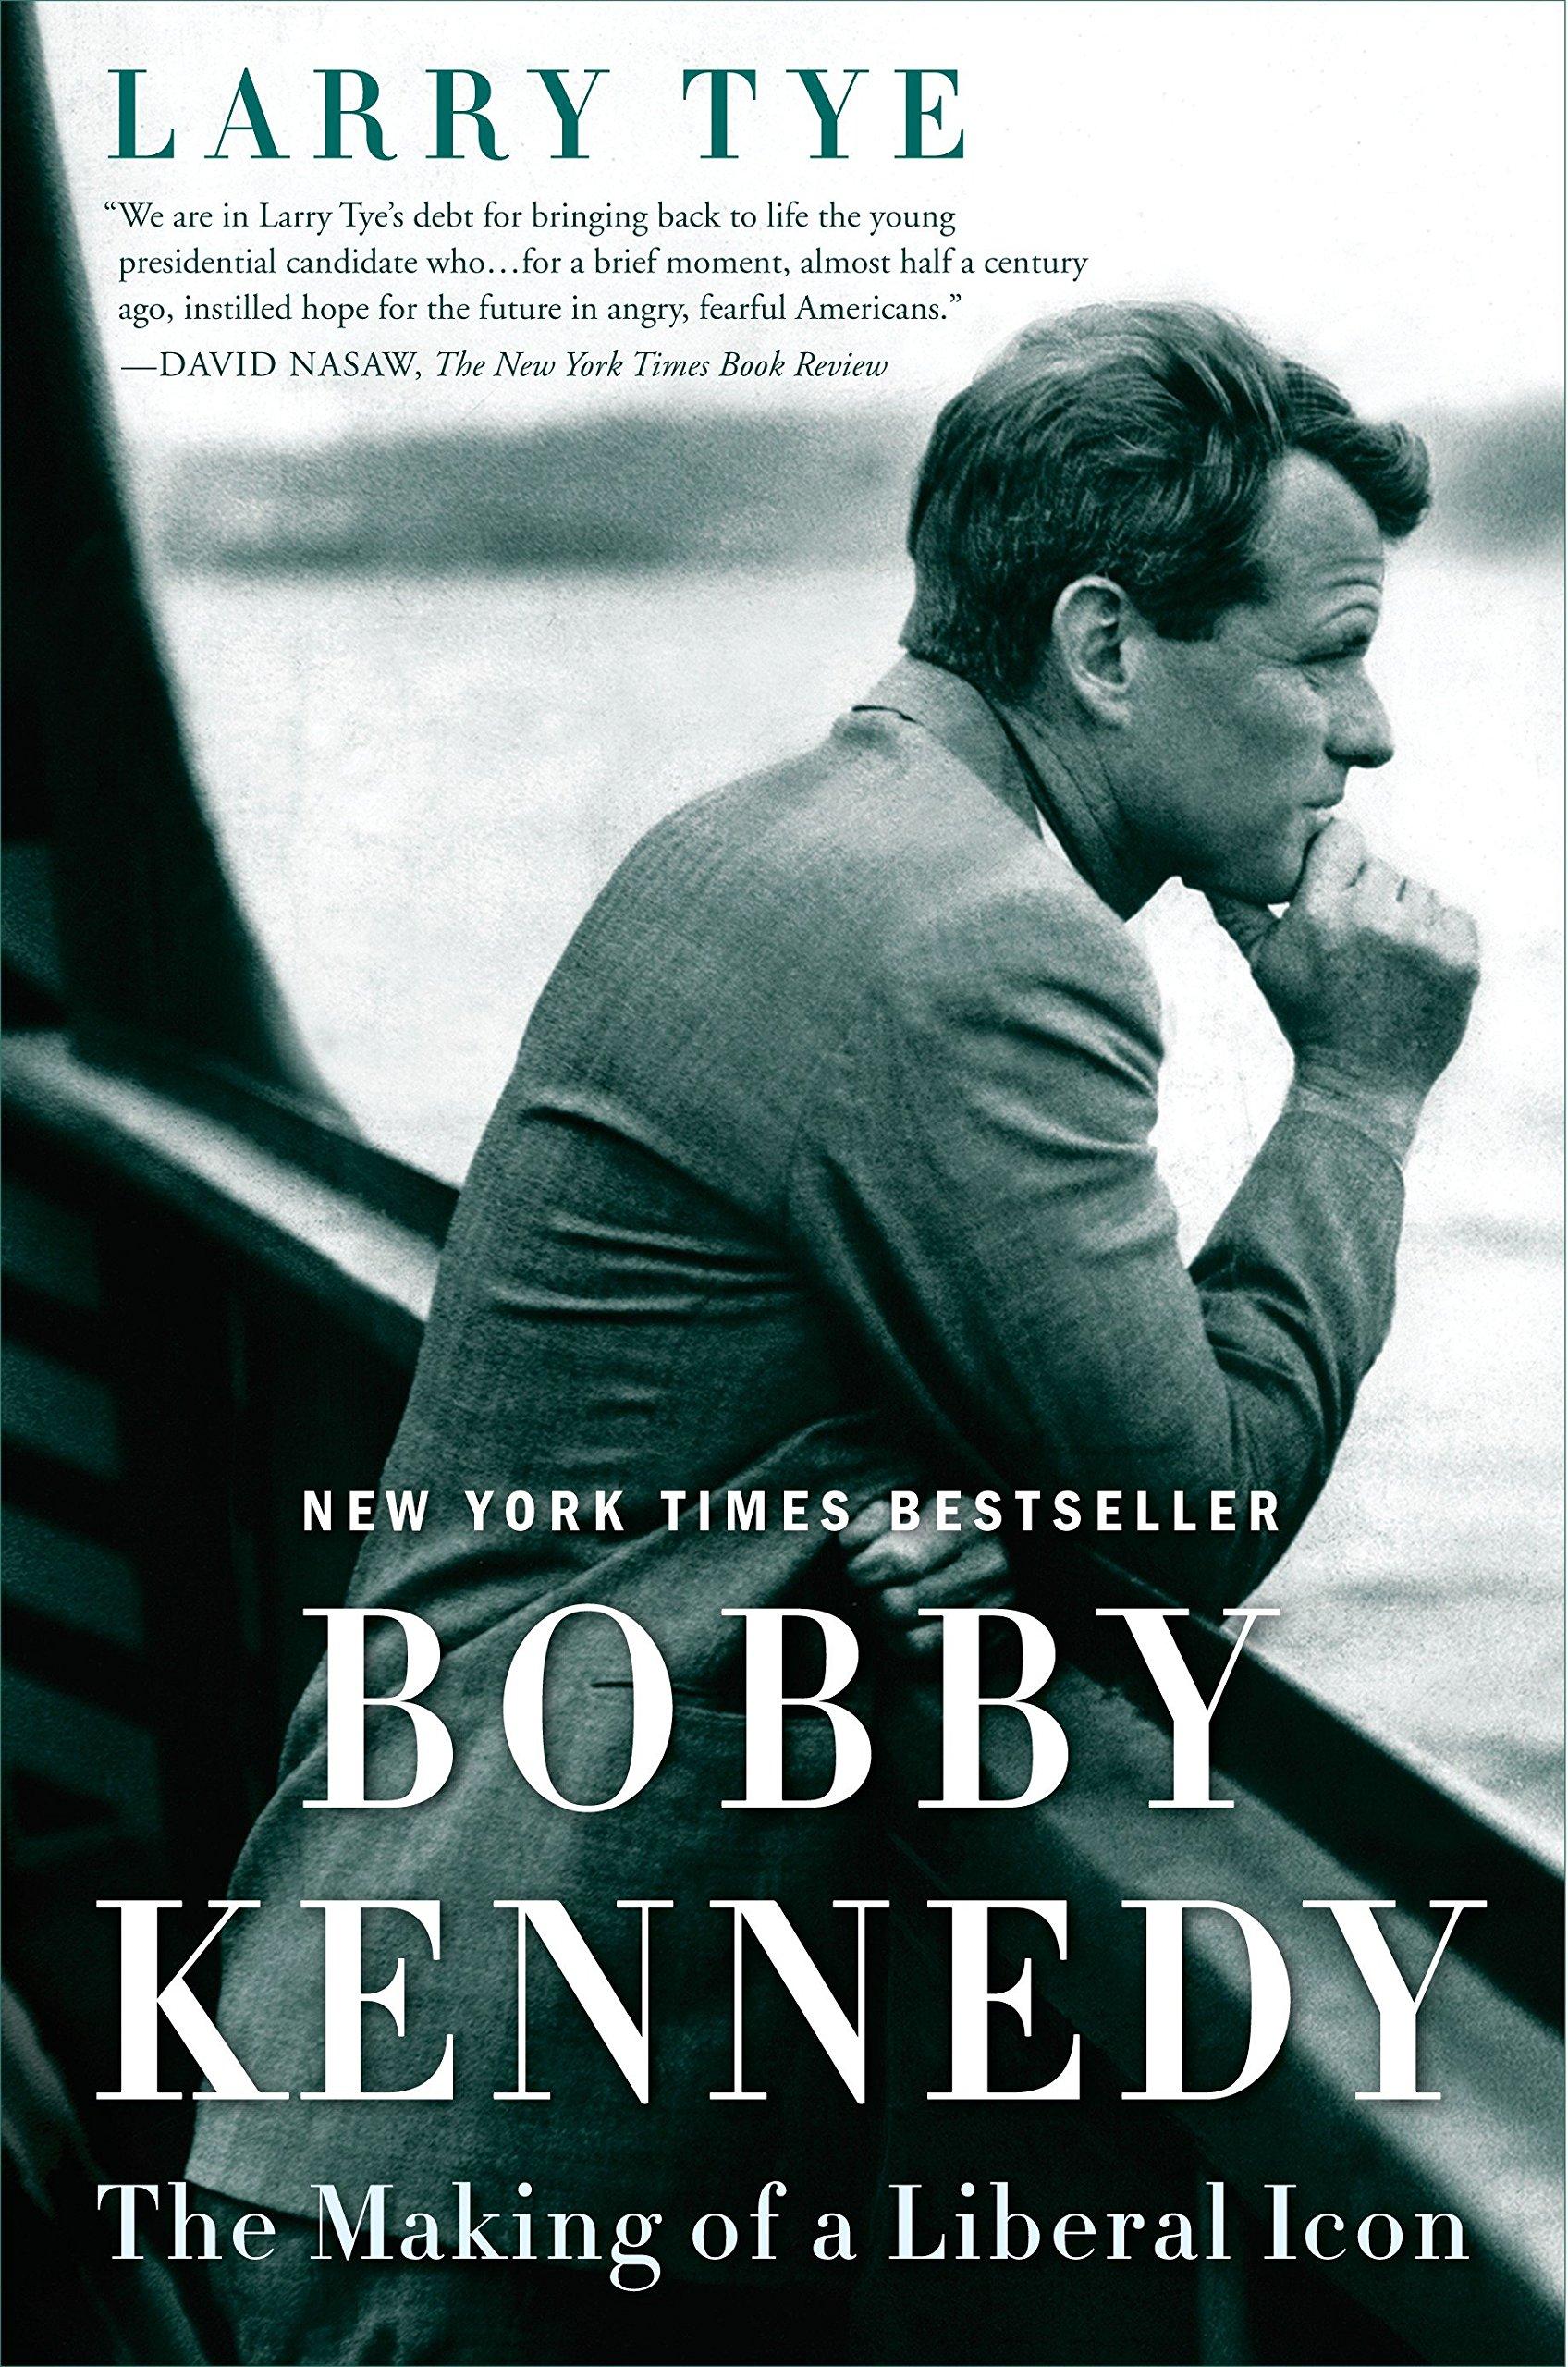 Bobby Kennedy Larry Tye 9780812983500 Books Gentleman Web Designer Storyteller And Electronic Hardware